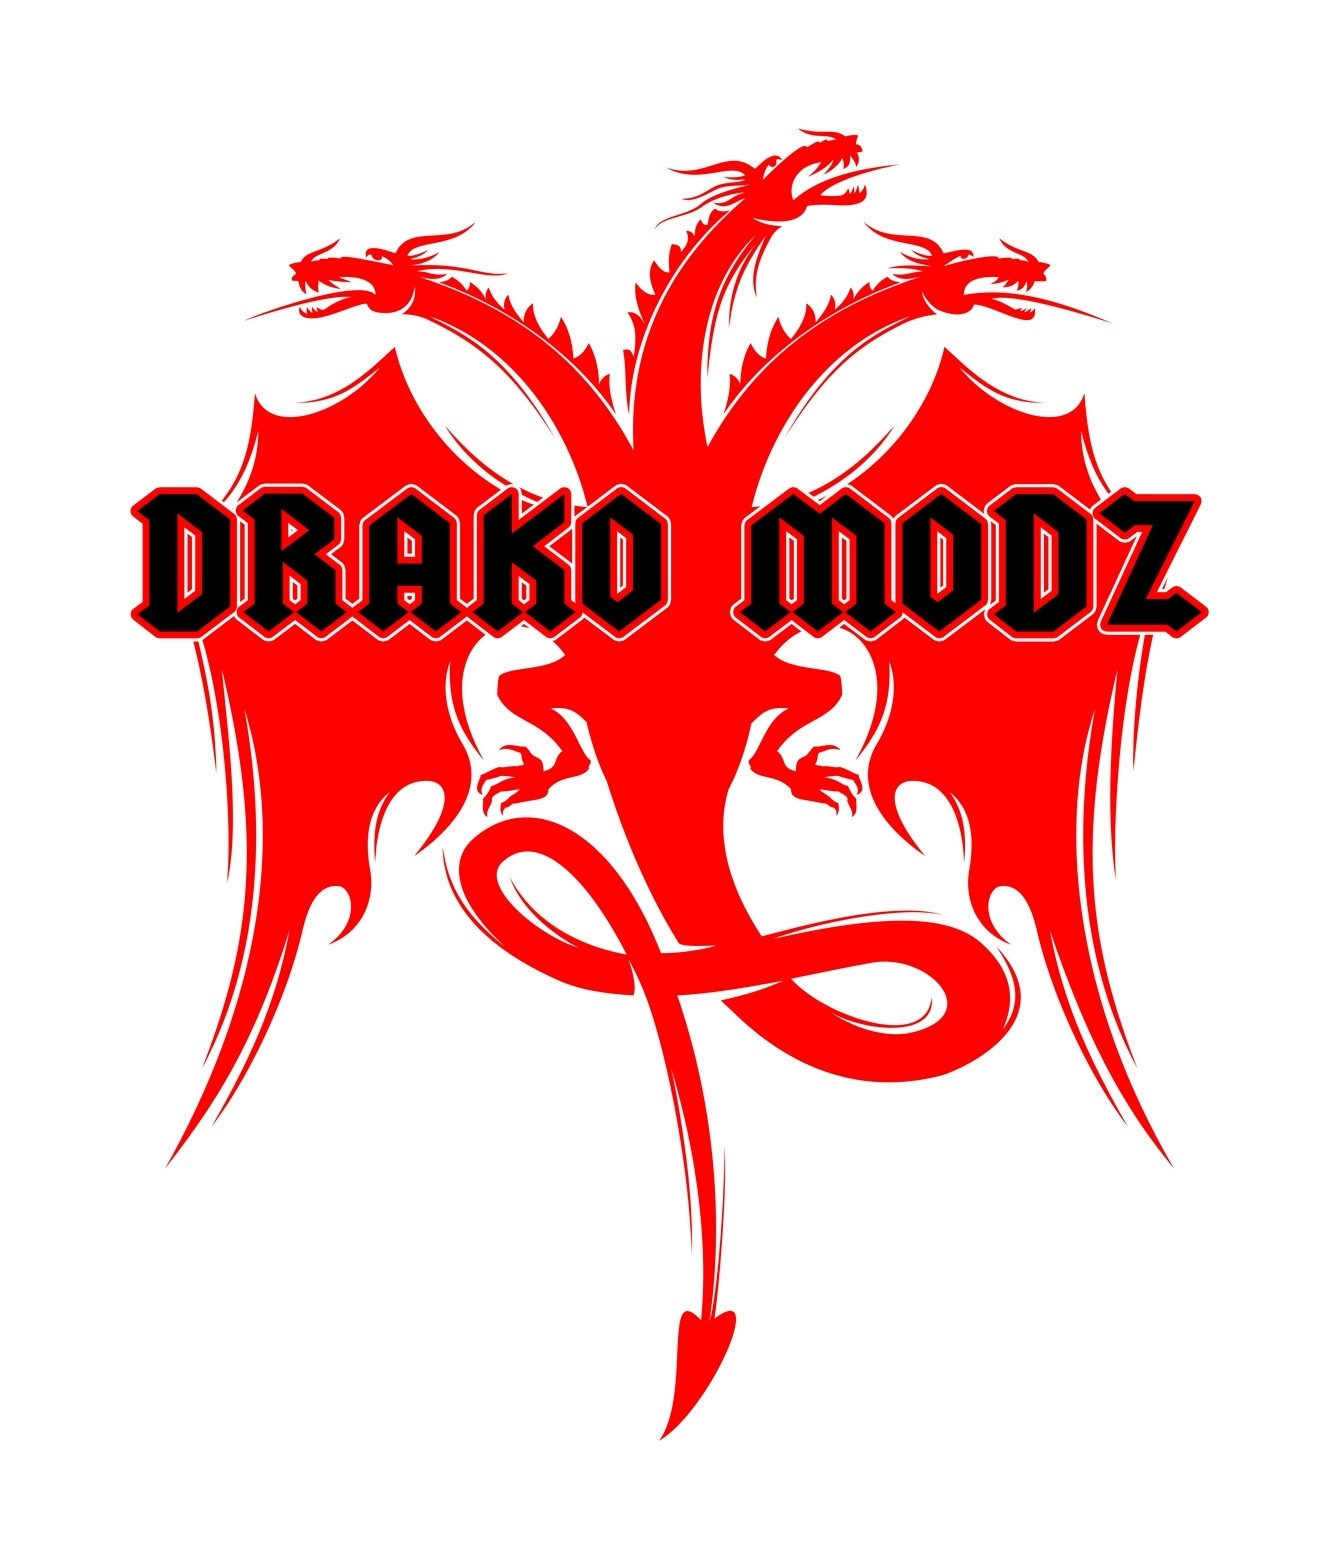 Drako Modz